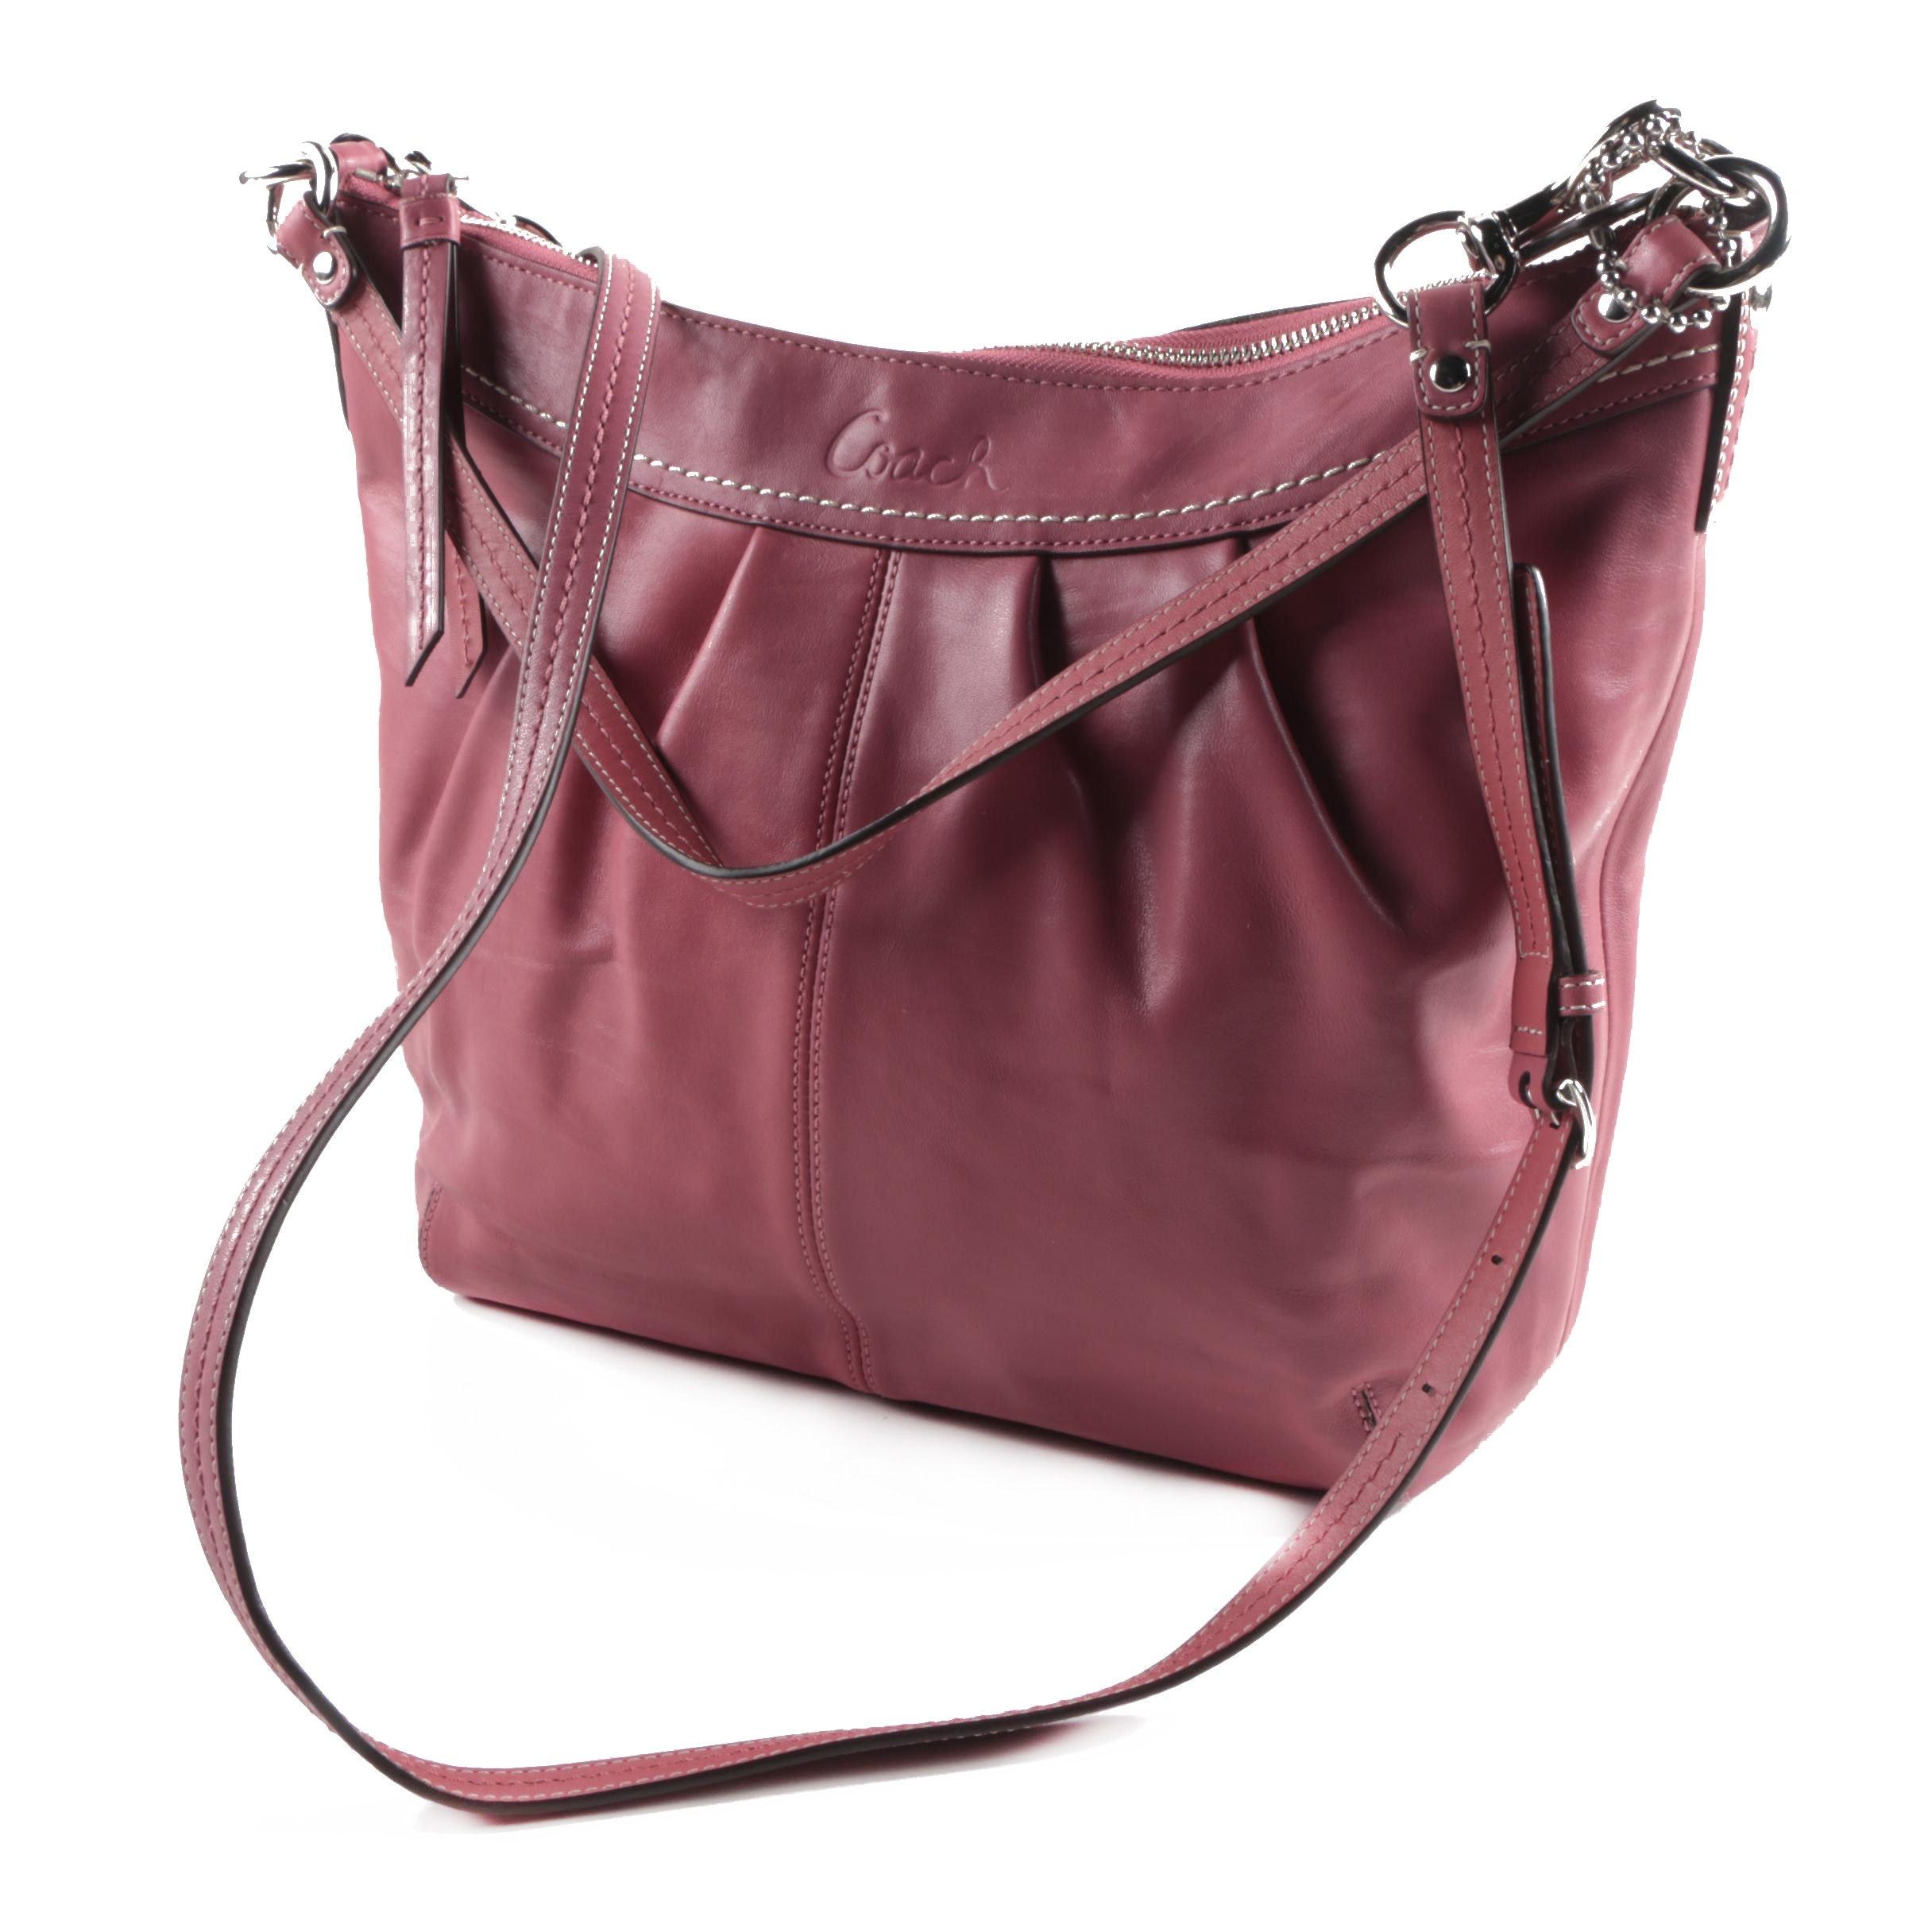 Coach Ashley Pleated Leather Crossbody Bag